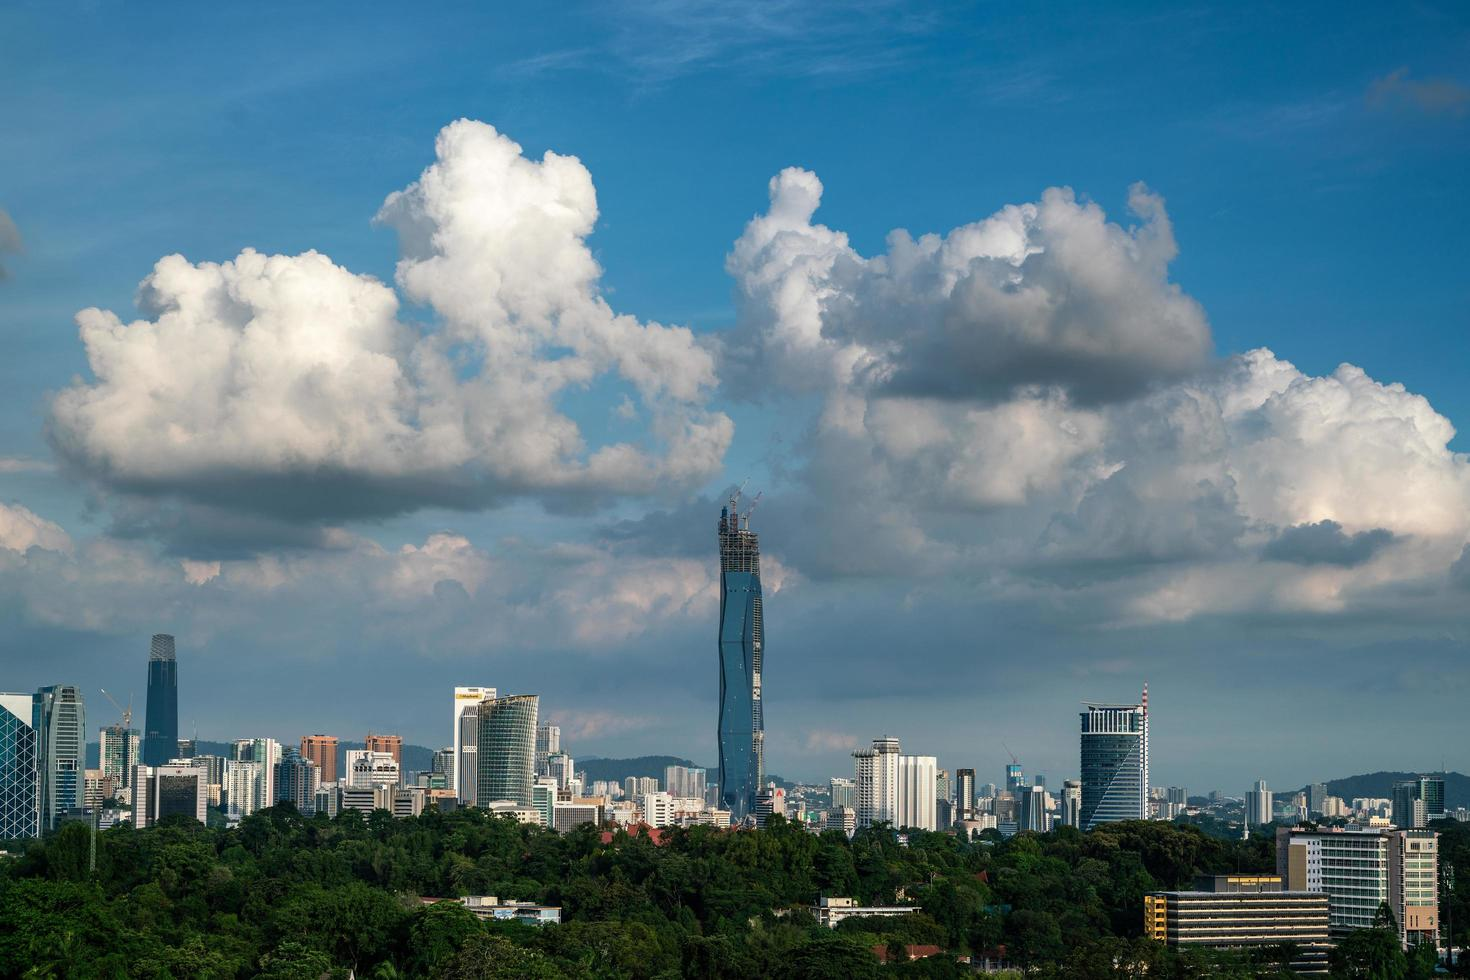 Kuala Lumpur, Malaysia 2021- Kuala Lumpur city skyline in the evening with dramatic clouds during sunset, taken from viewpoint in Bukit Tunku, Kuala lumpur photo